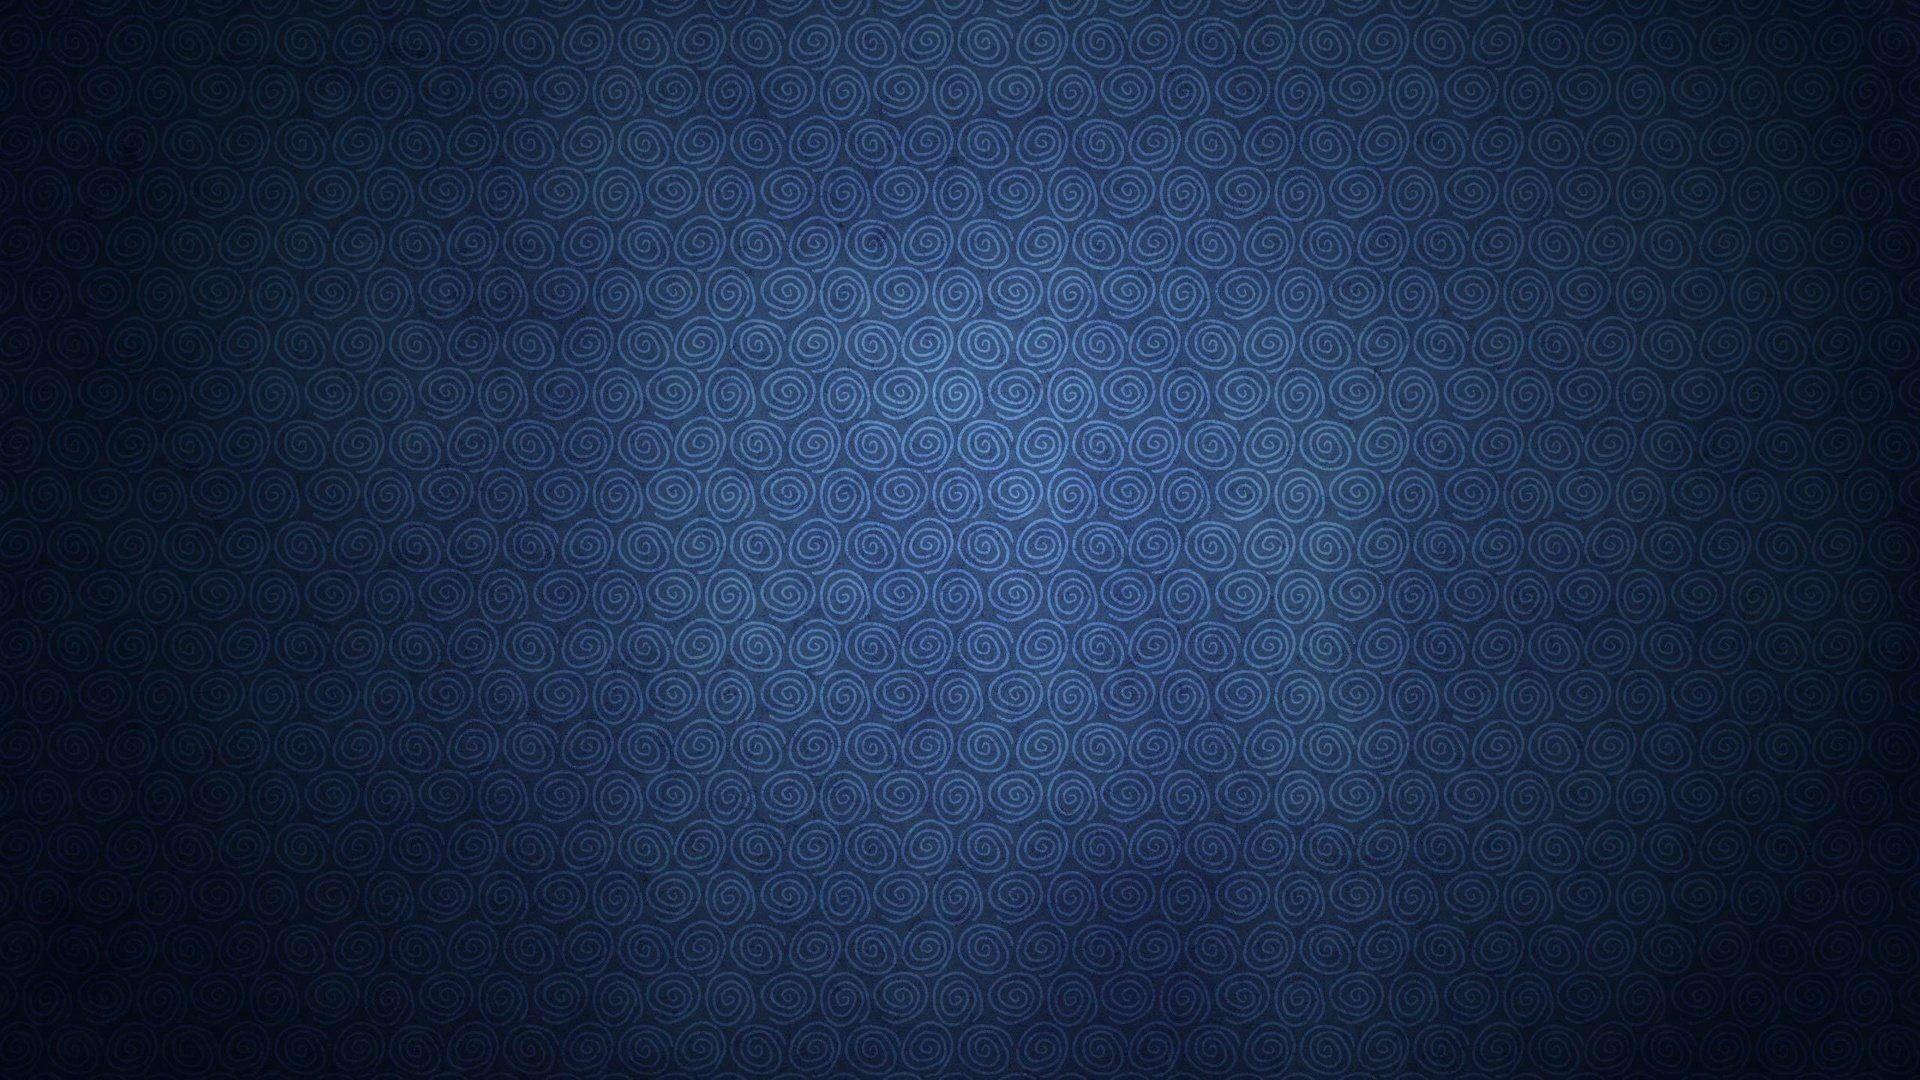 Website Background Texture wallpaper for laptop